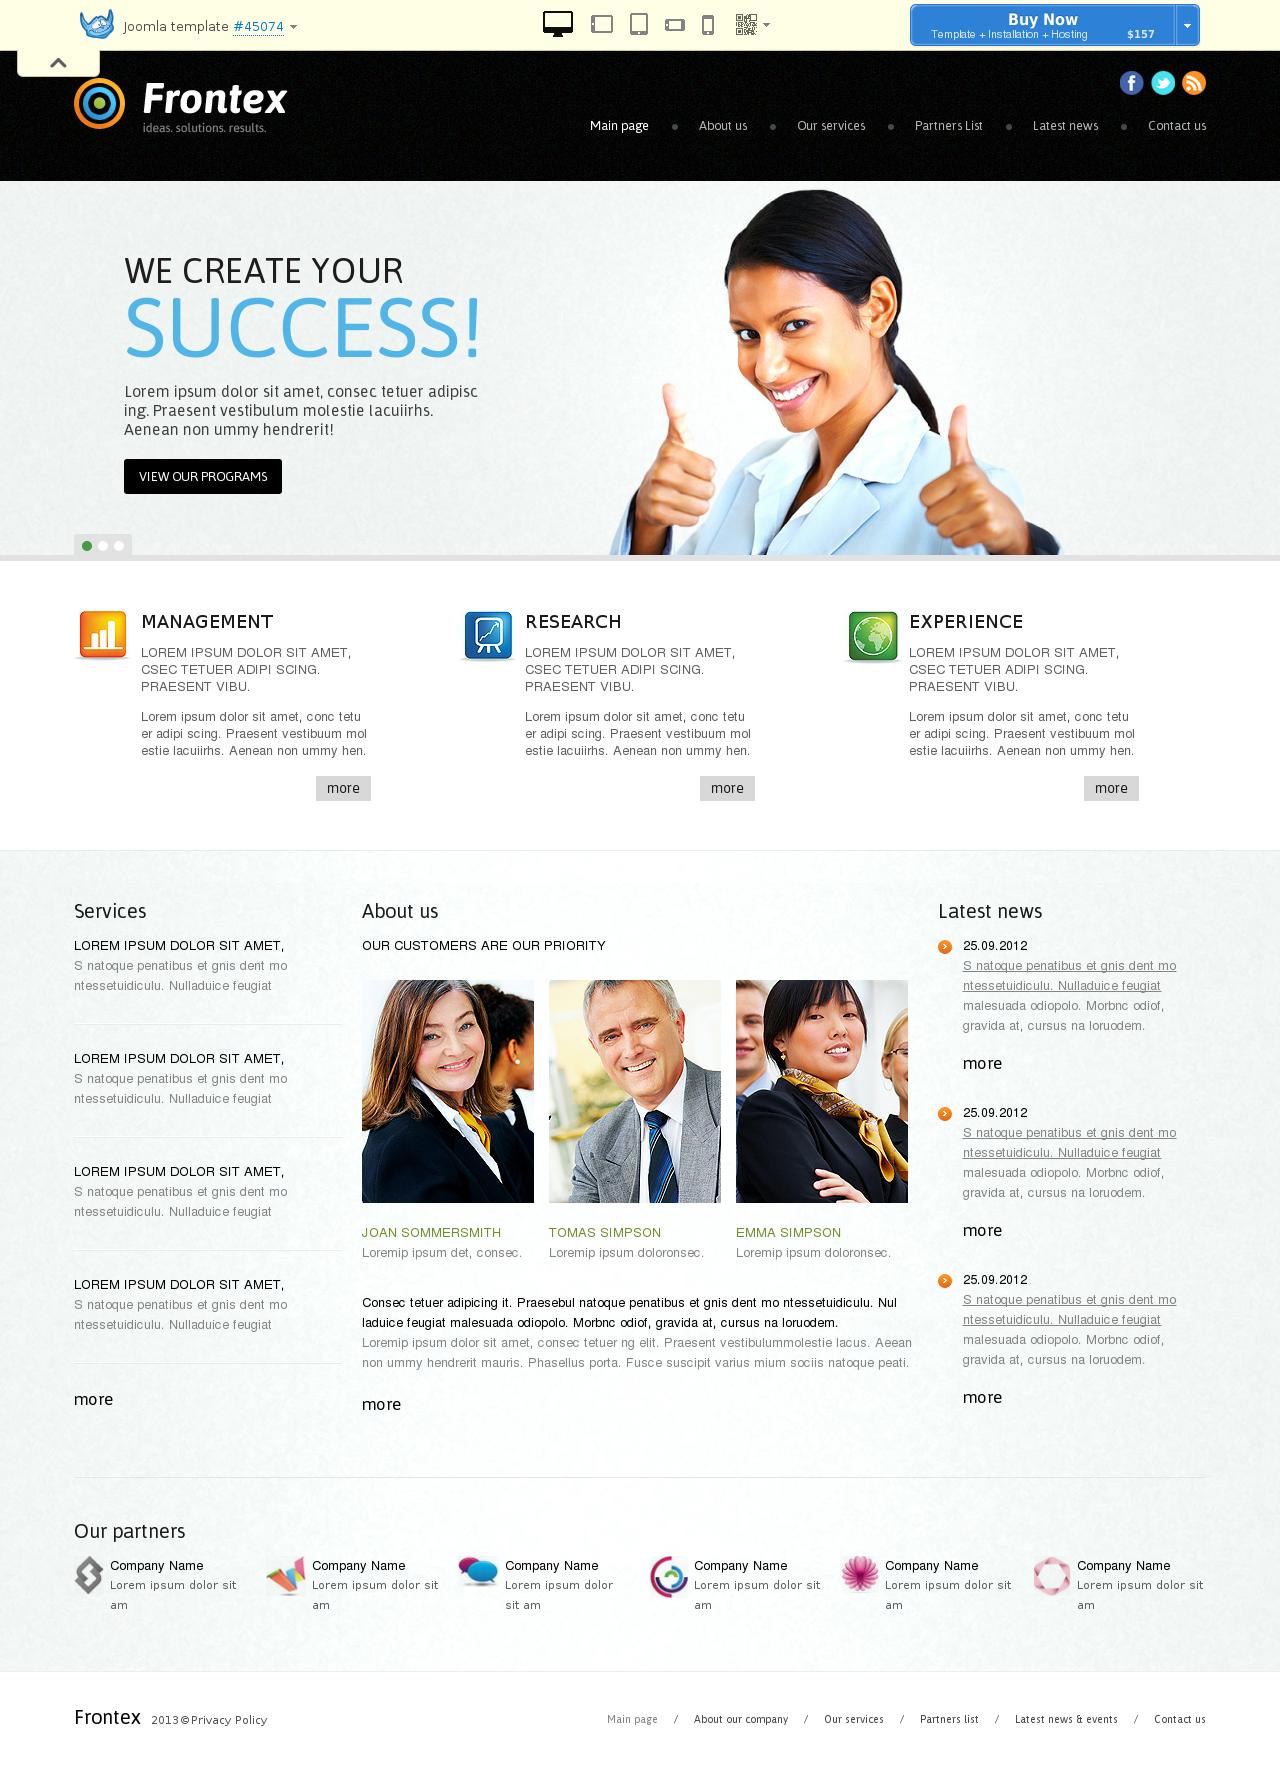 Investment Business Online Joomla Template #45074